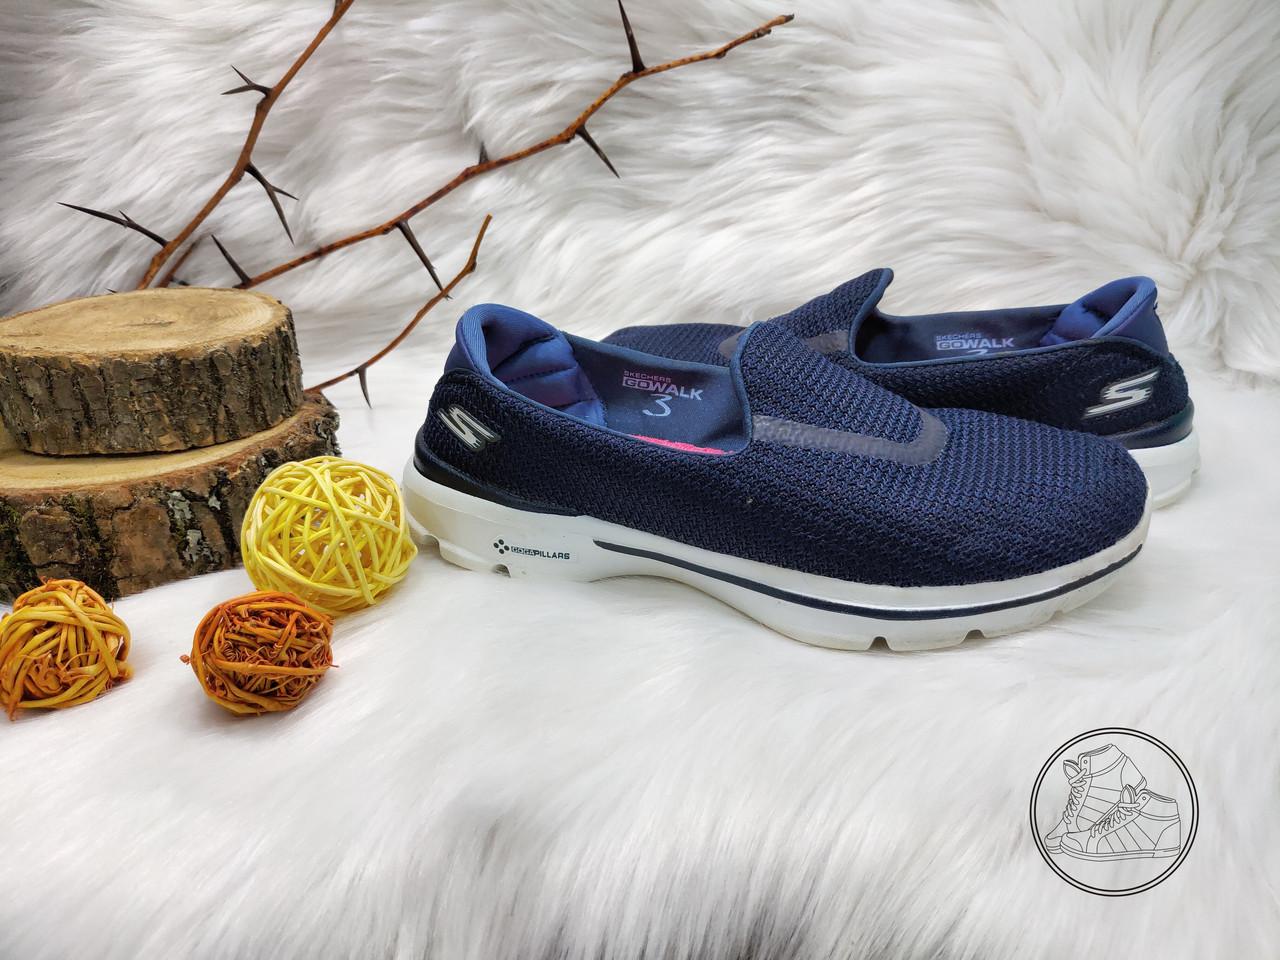 Эспадрильи Skechers Go walk 3 (35 размер) бу